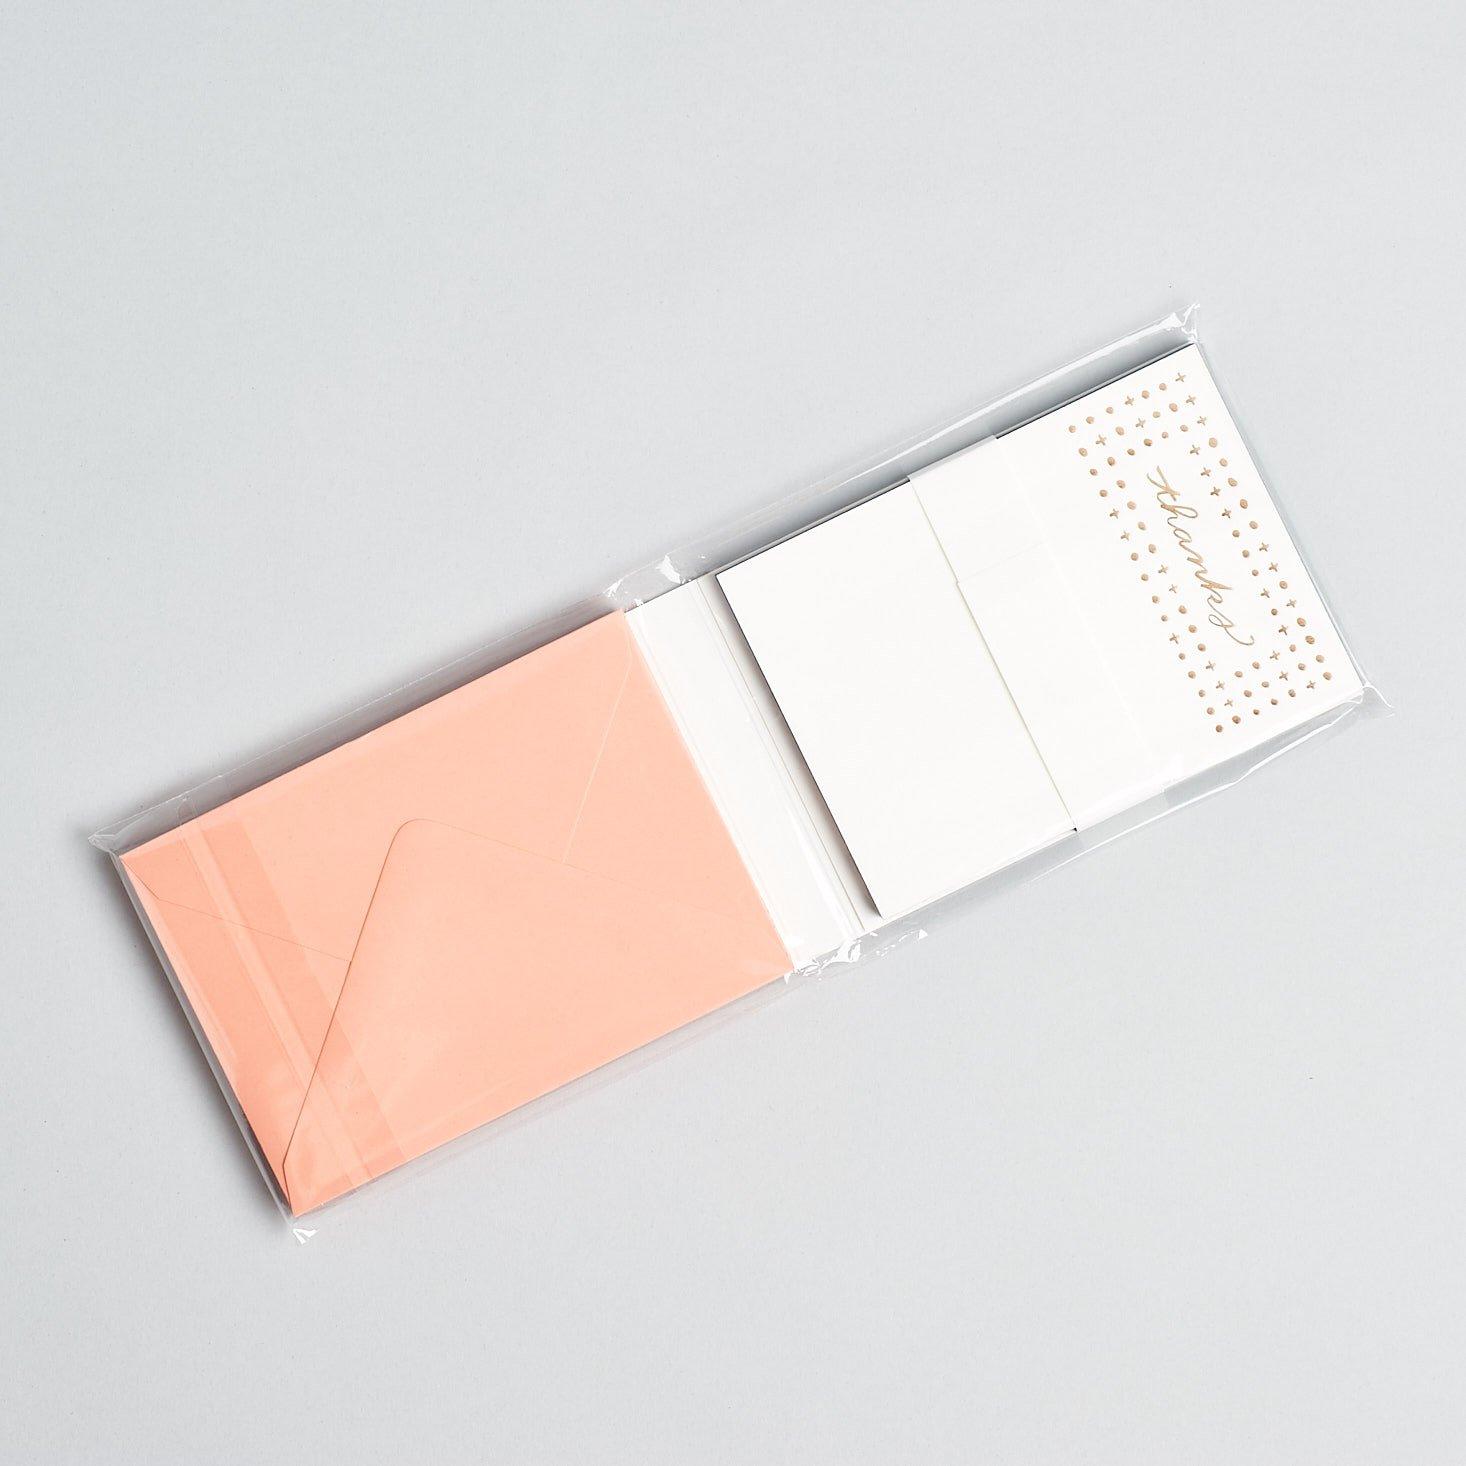 Postmarkd Studio May 2019 stationary subscription box review